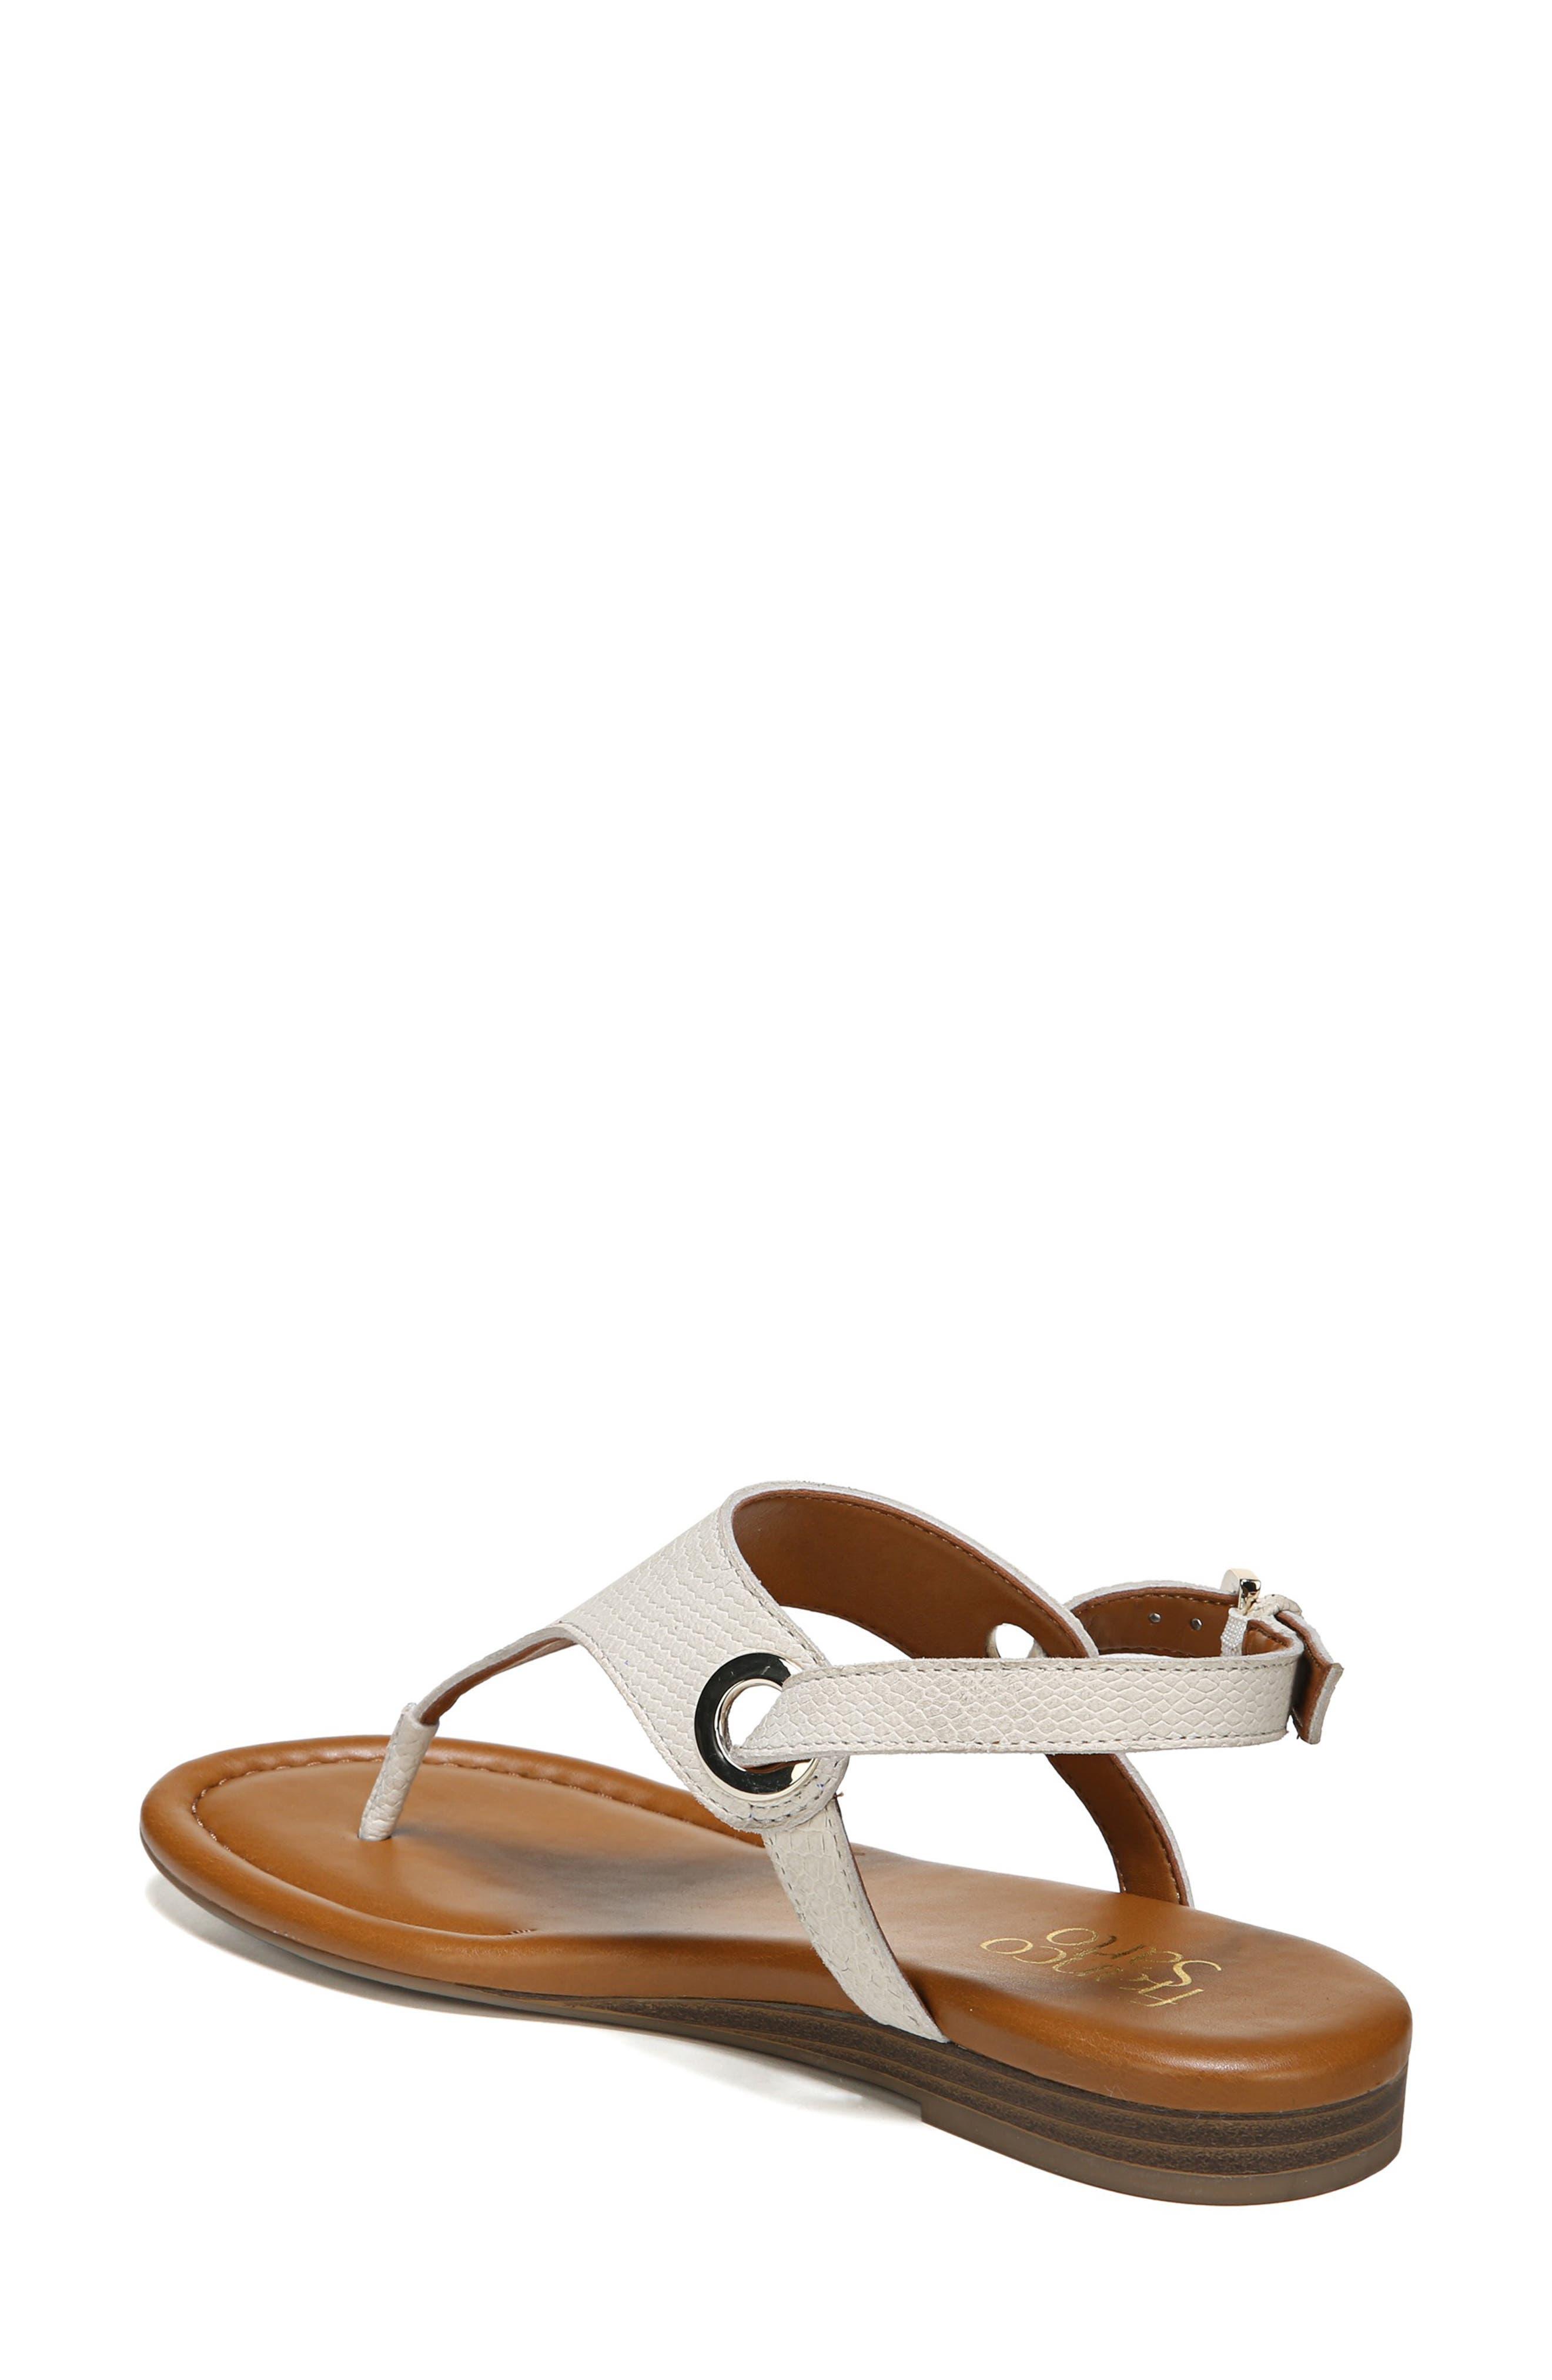 4544a1a2026c9 Women s Wedge Sandals